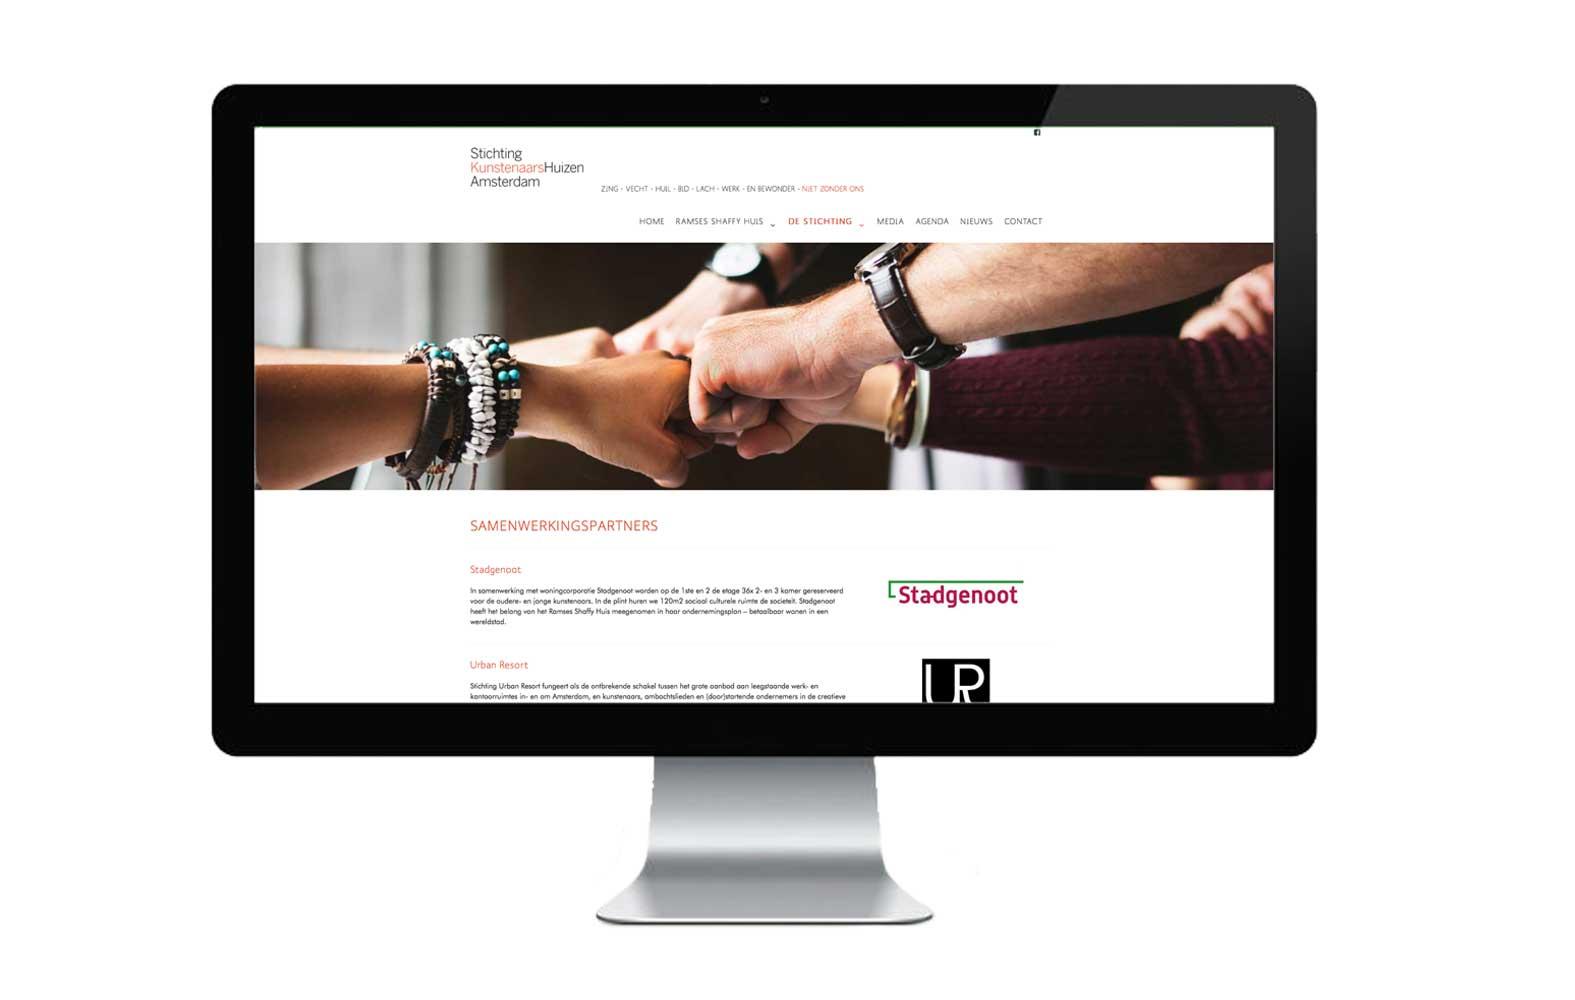 StudioErnst-KunstenaarshuizenAmsterdam-samenwerkingspartners-website